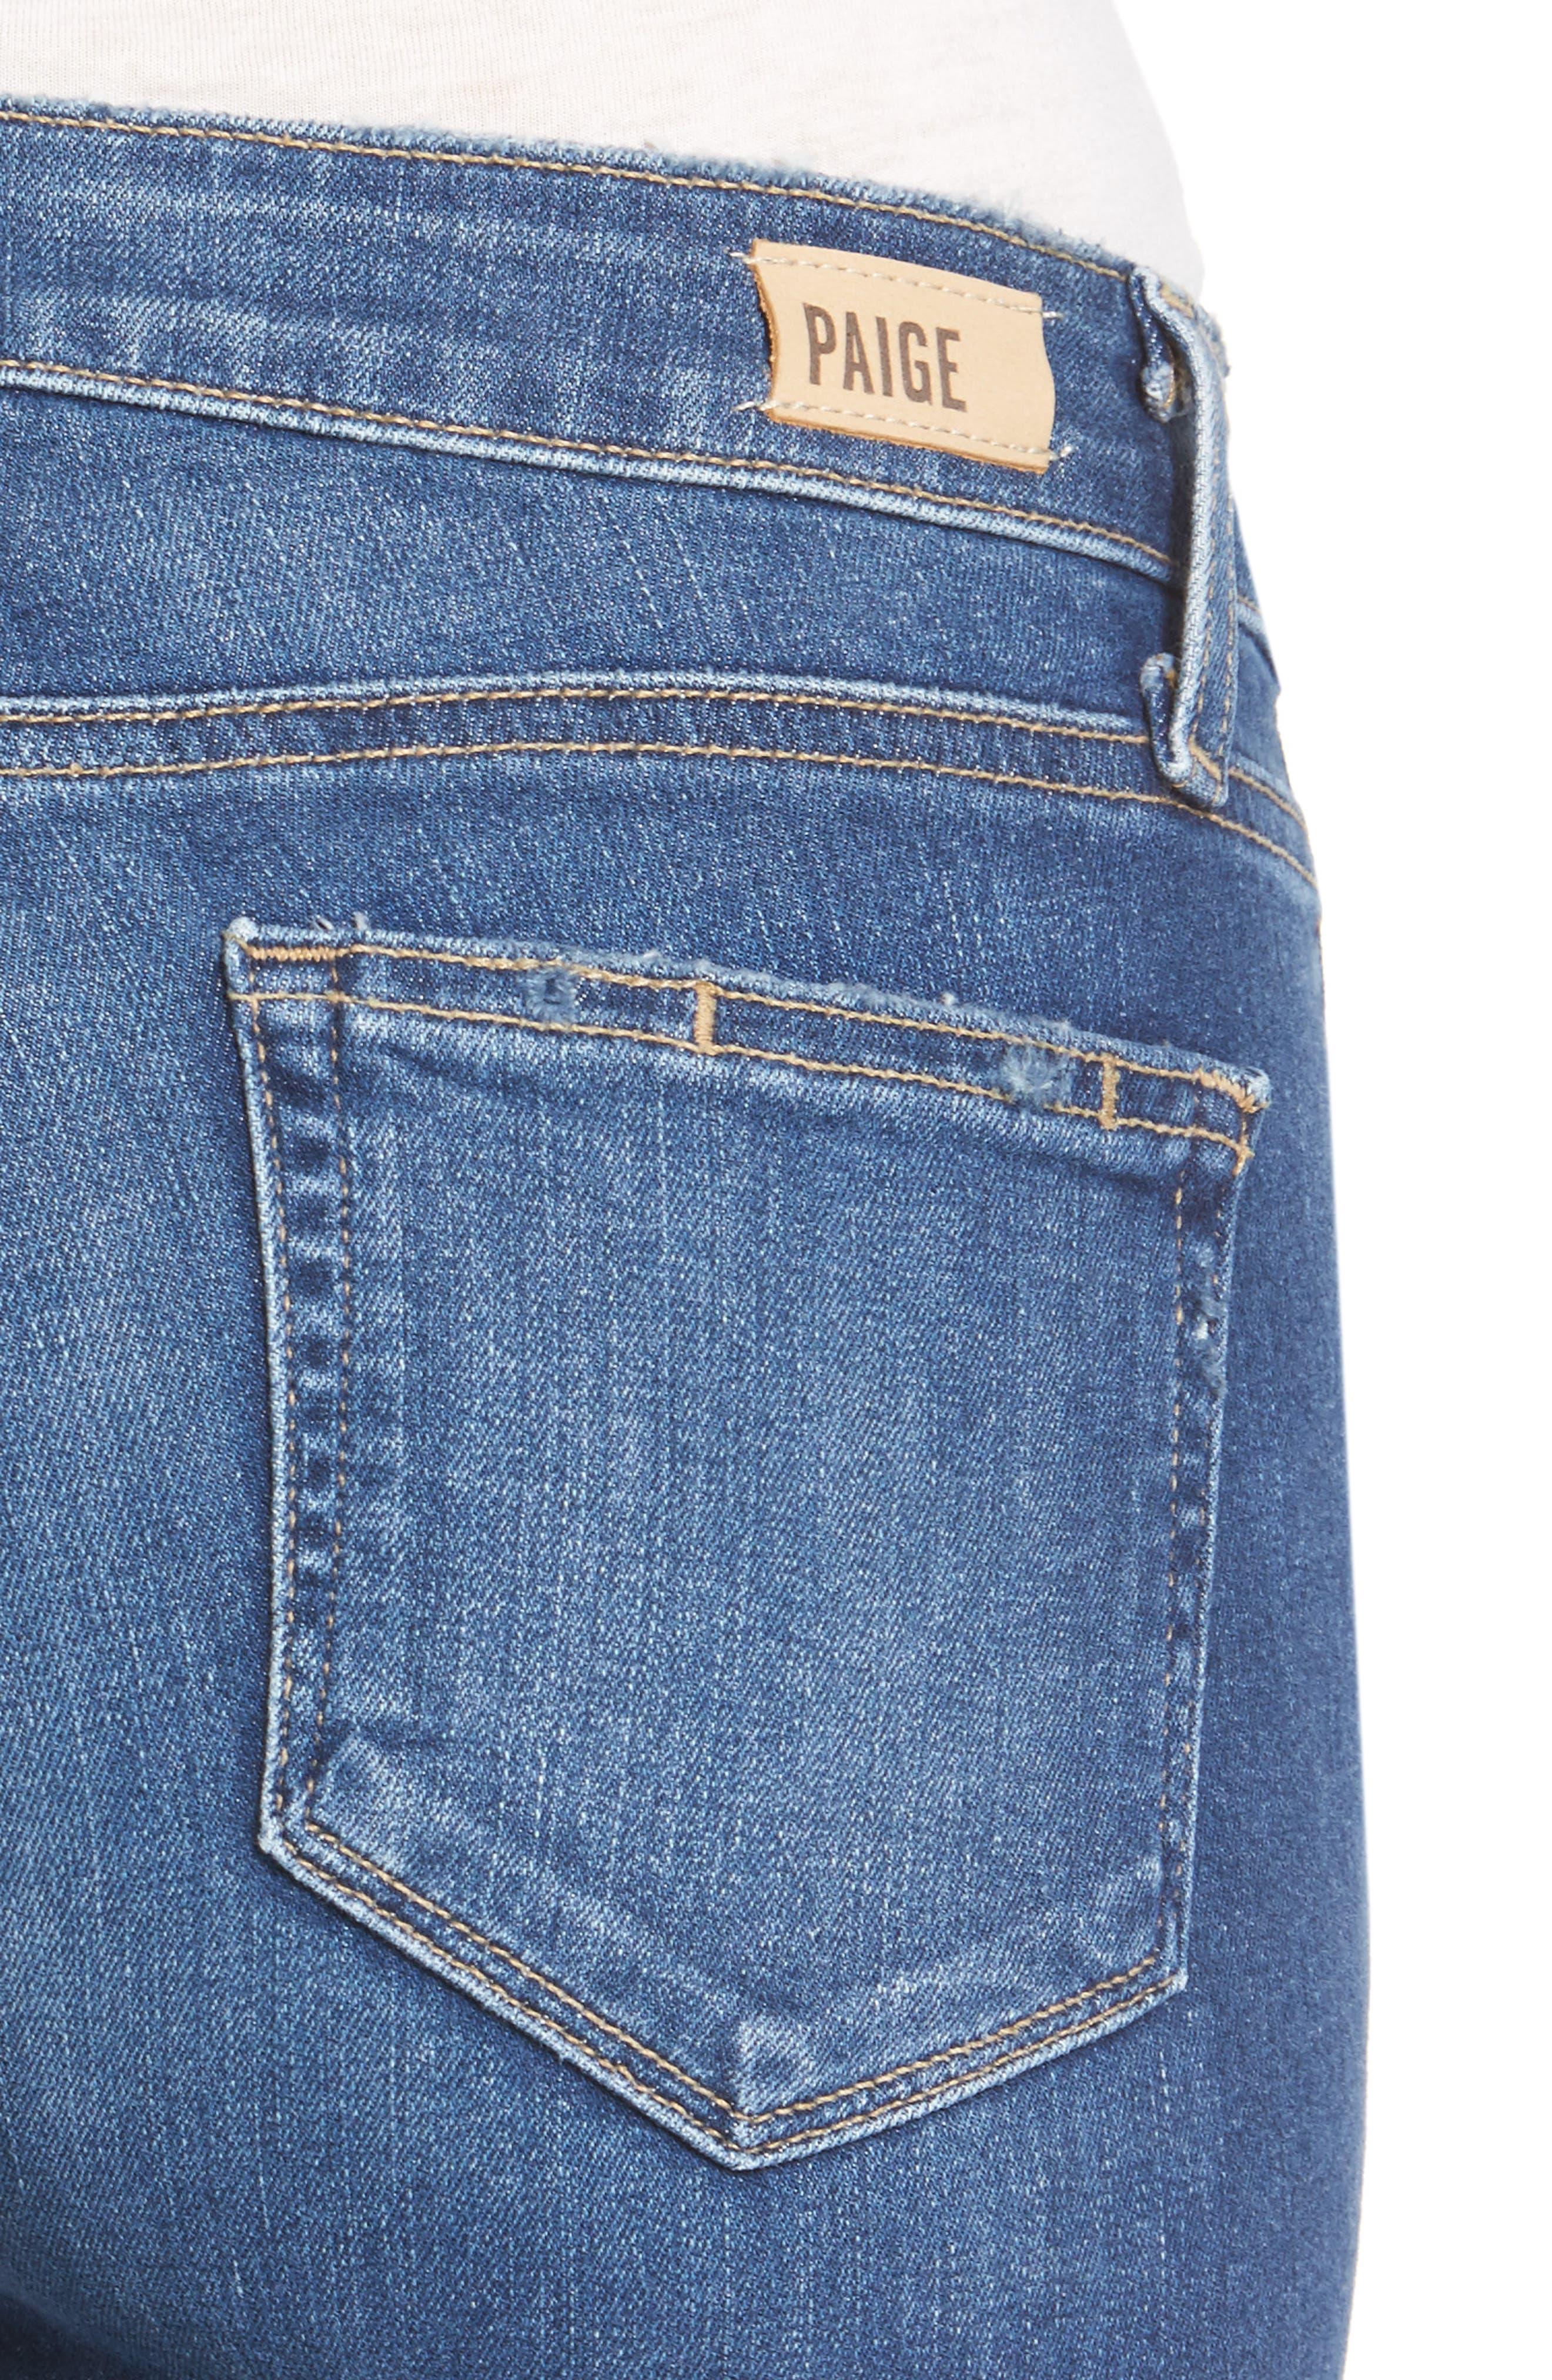 Alternate Image 4  - PAIGE Verdugo Ankle Ultra Skinny Jeans (Bali)